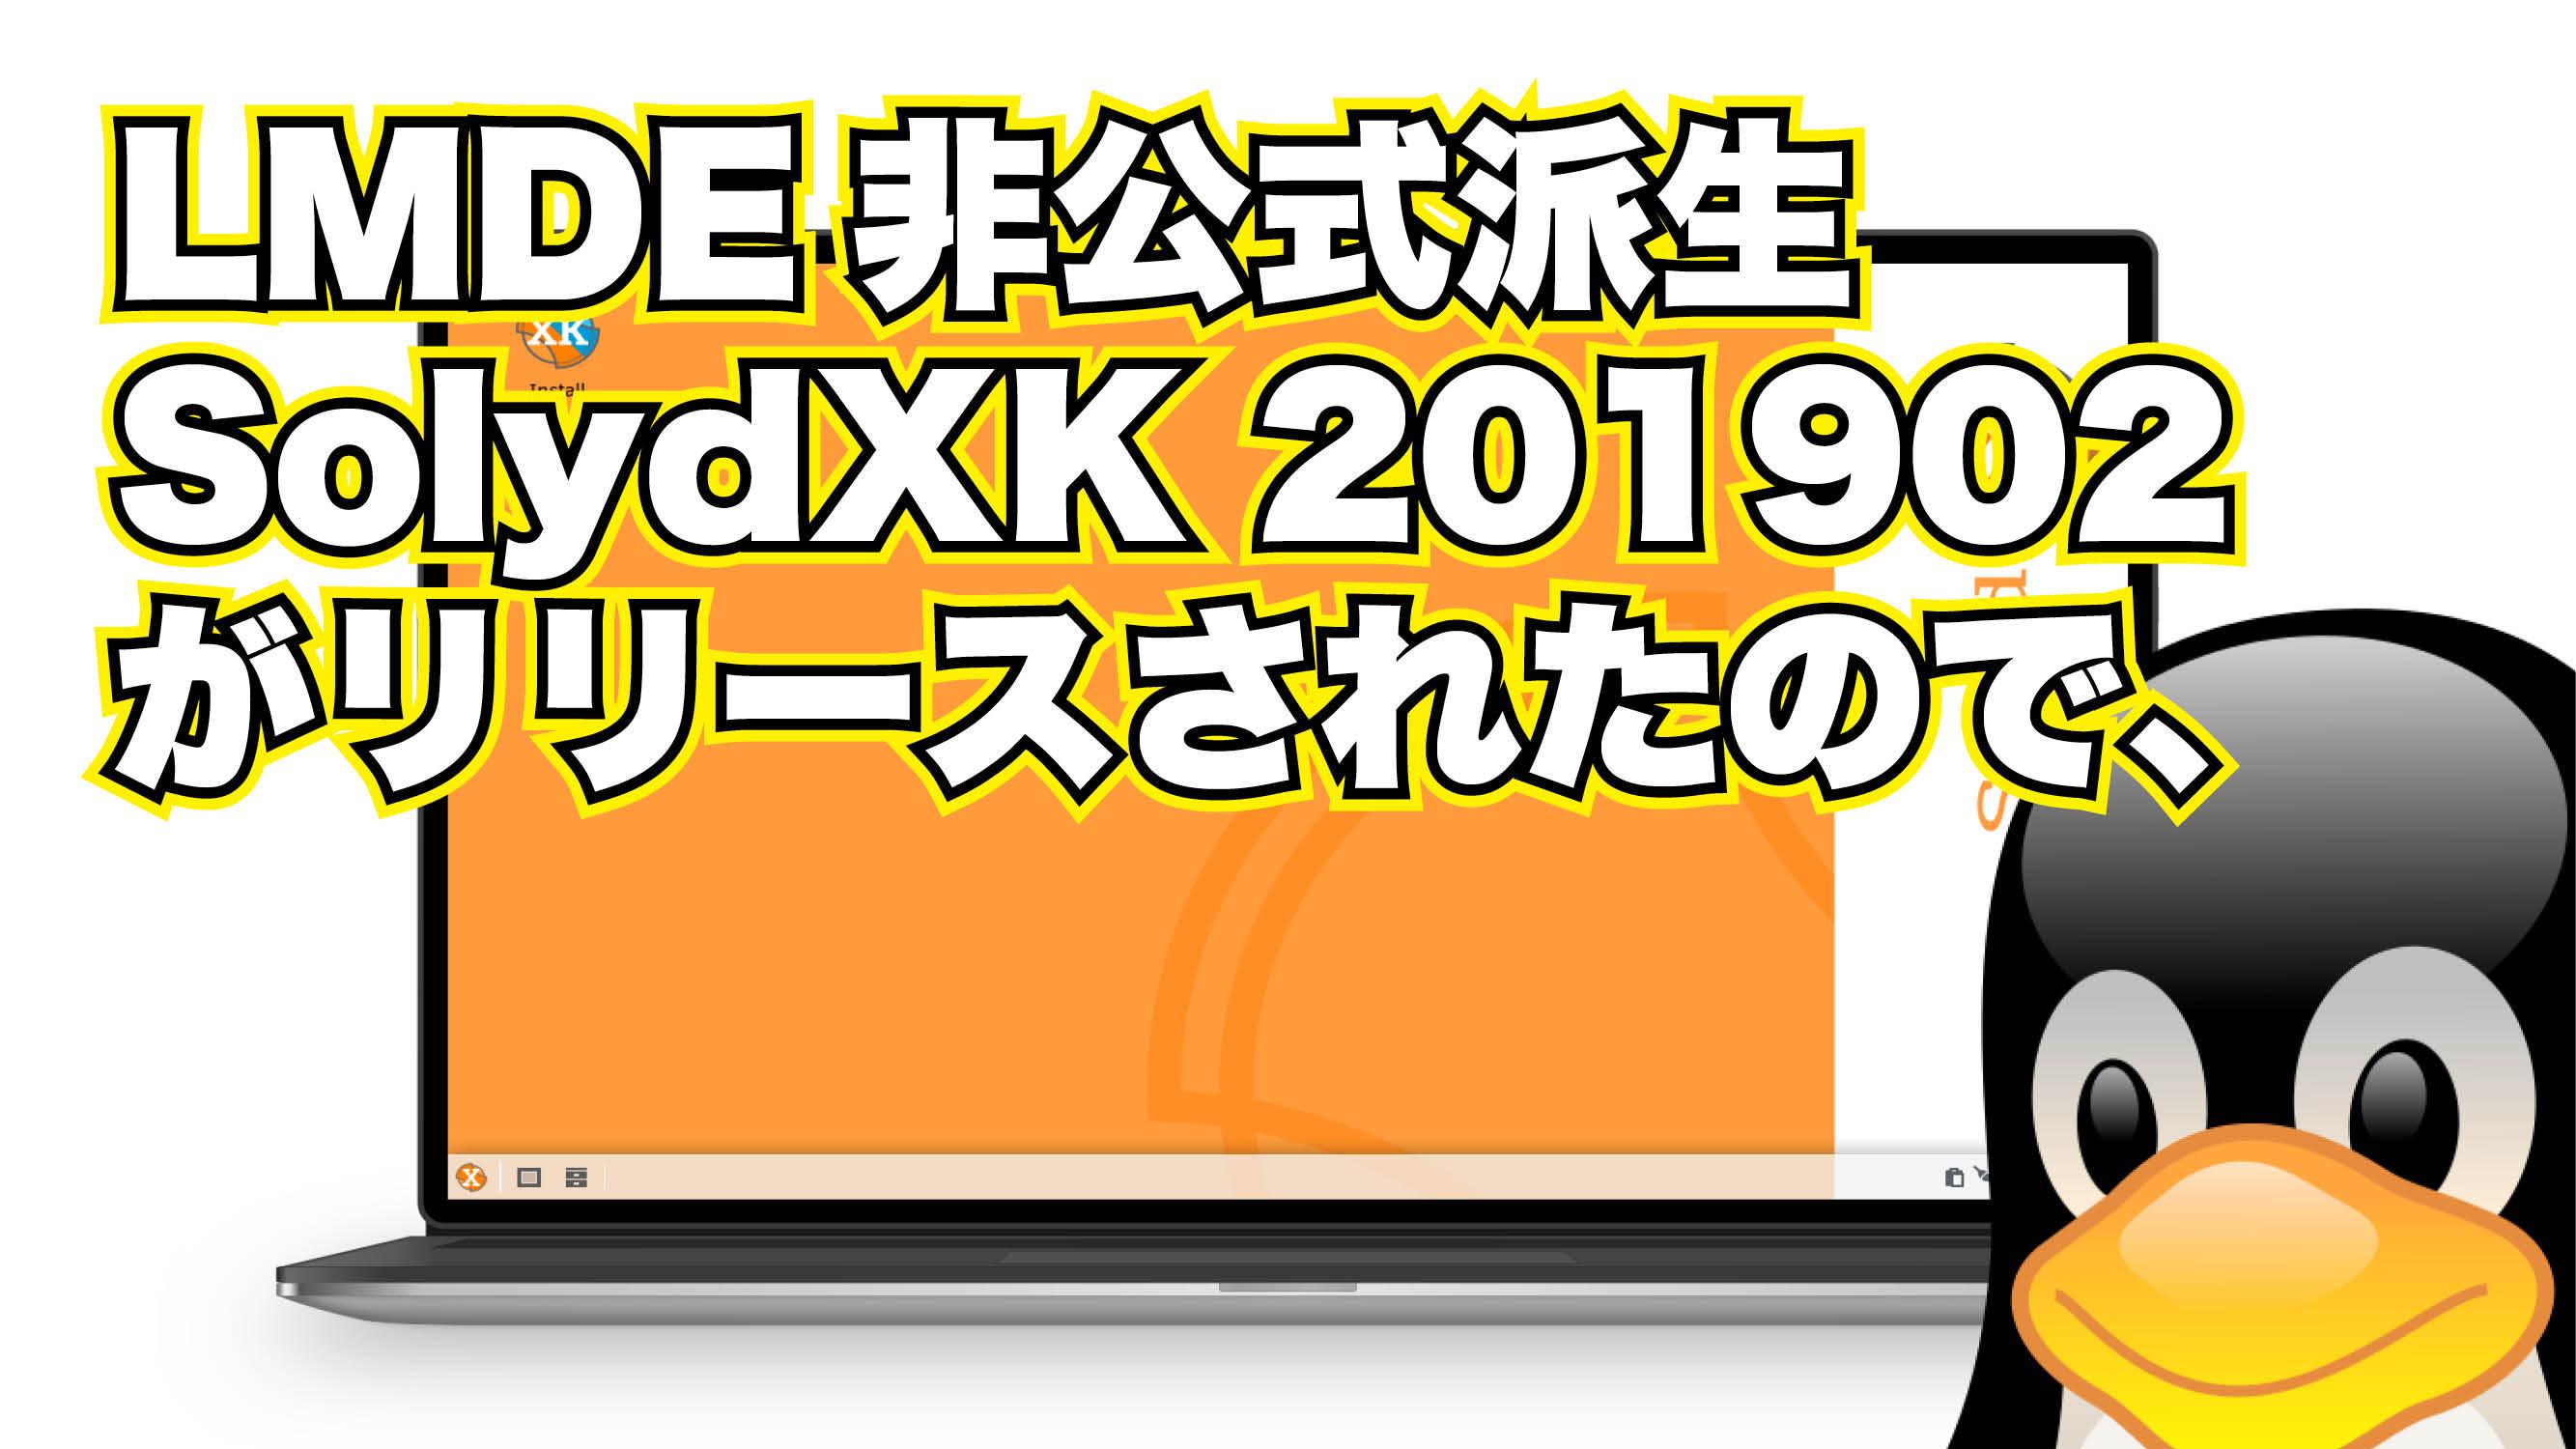 Linux Mint の非公式派生 SolydXK 201902 がリリースされたので、